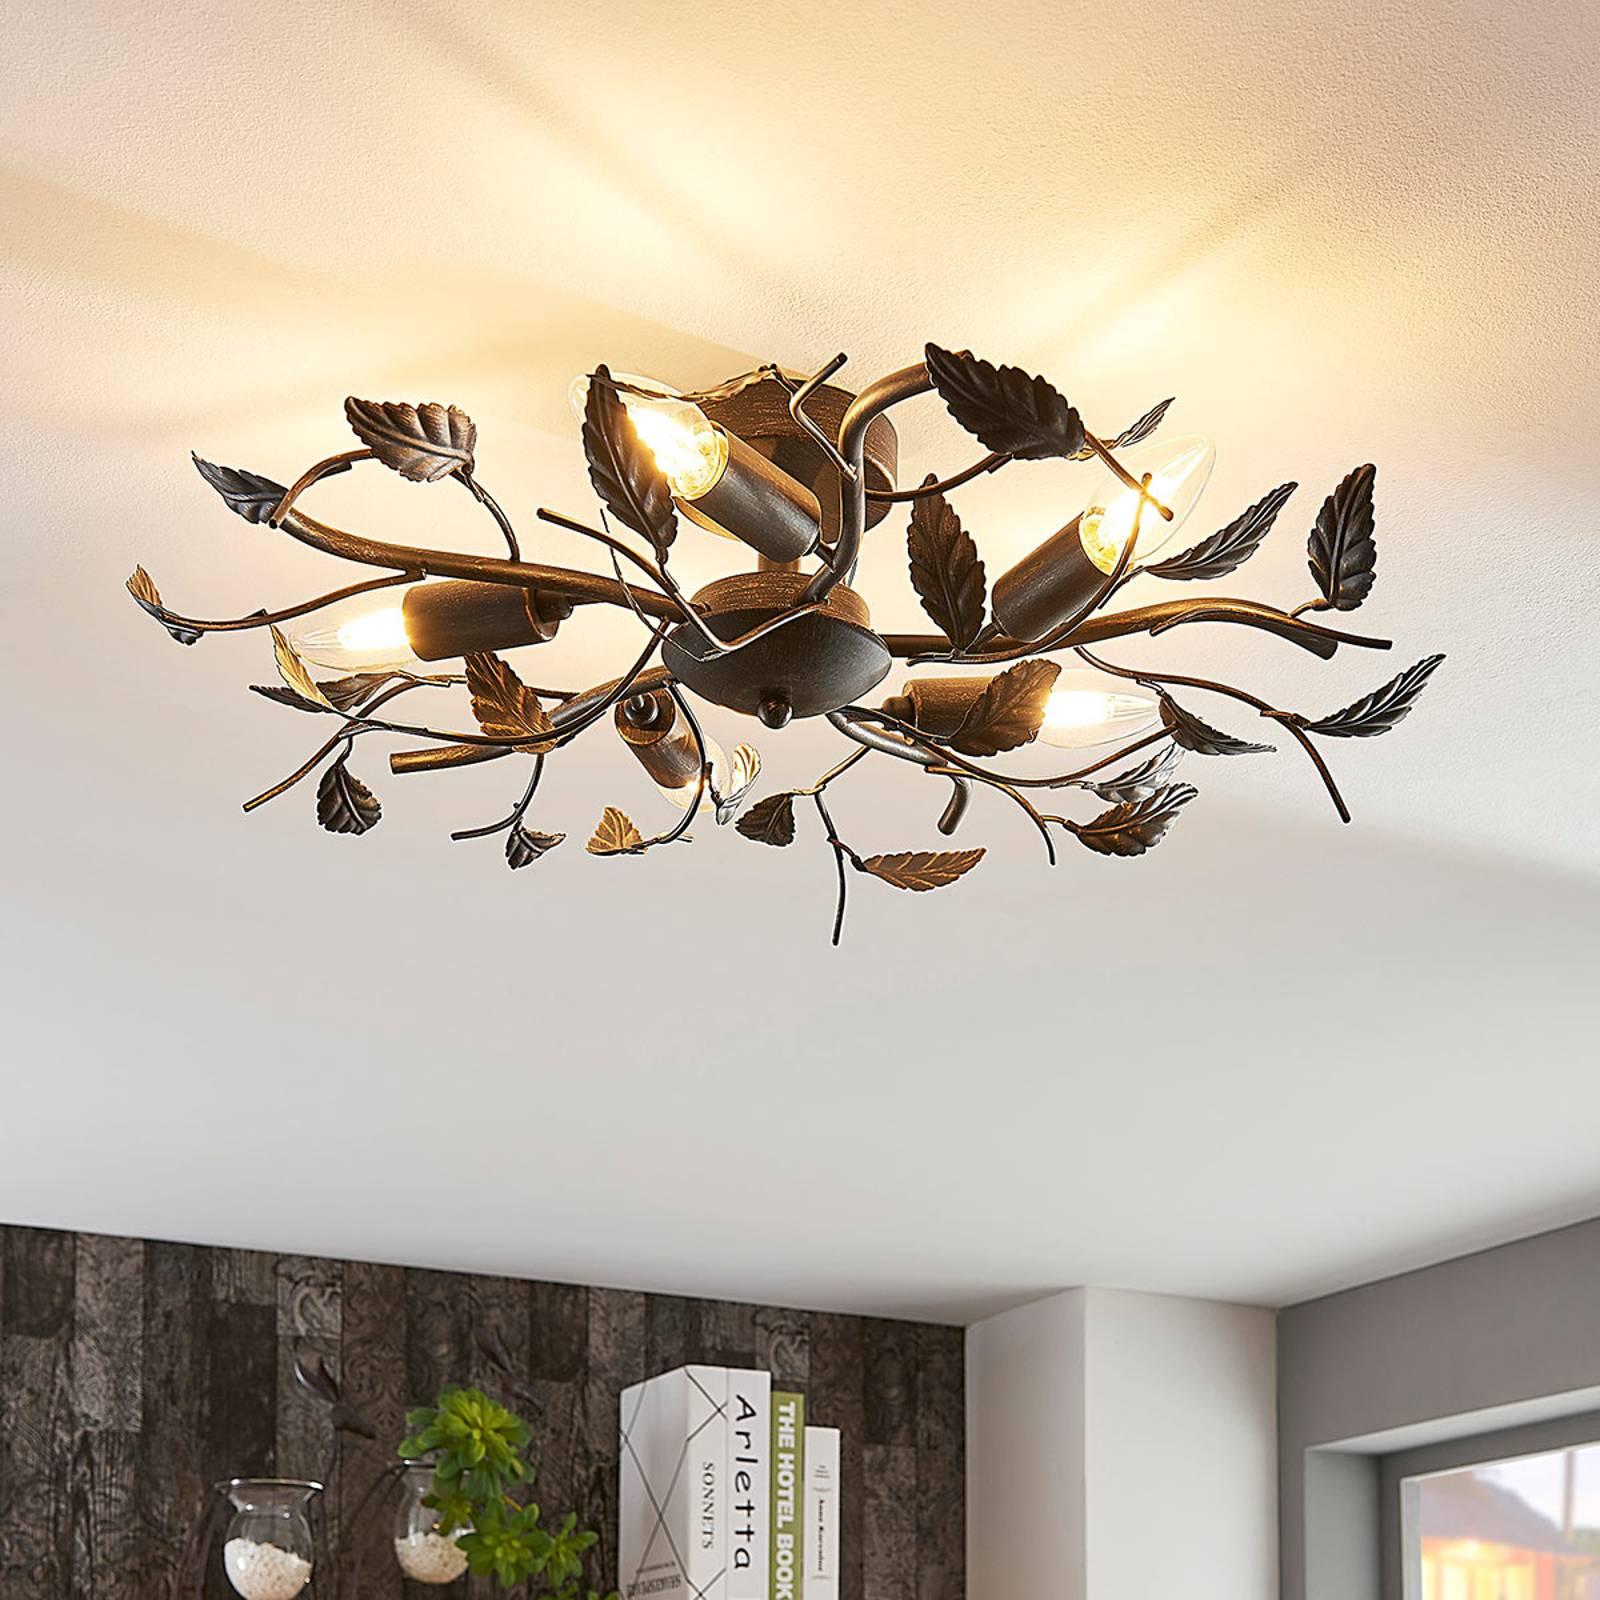 Decoratieve plafondlamp Yos, bladversiering